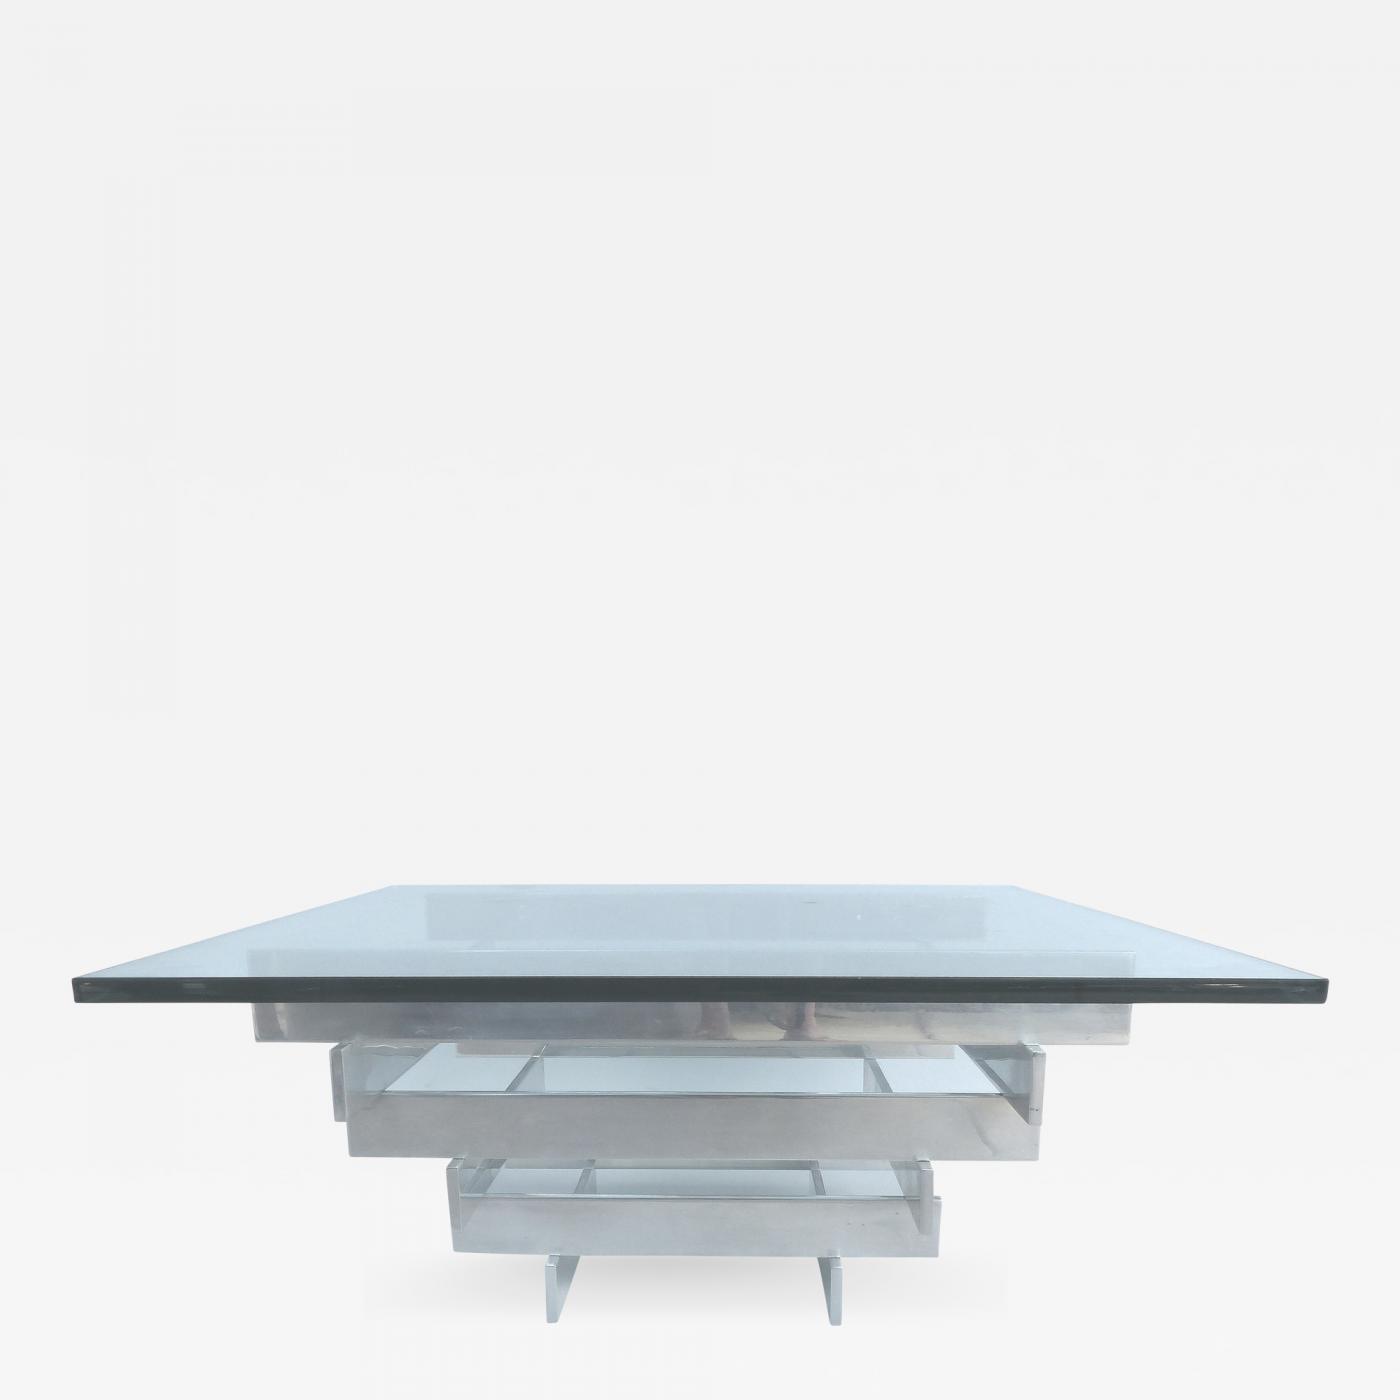 Paul Mayen Paul Mayen Aluminum And Glass Coffee Table For Habitat